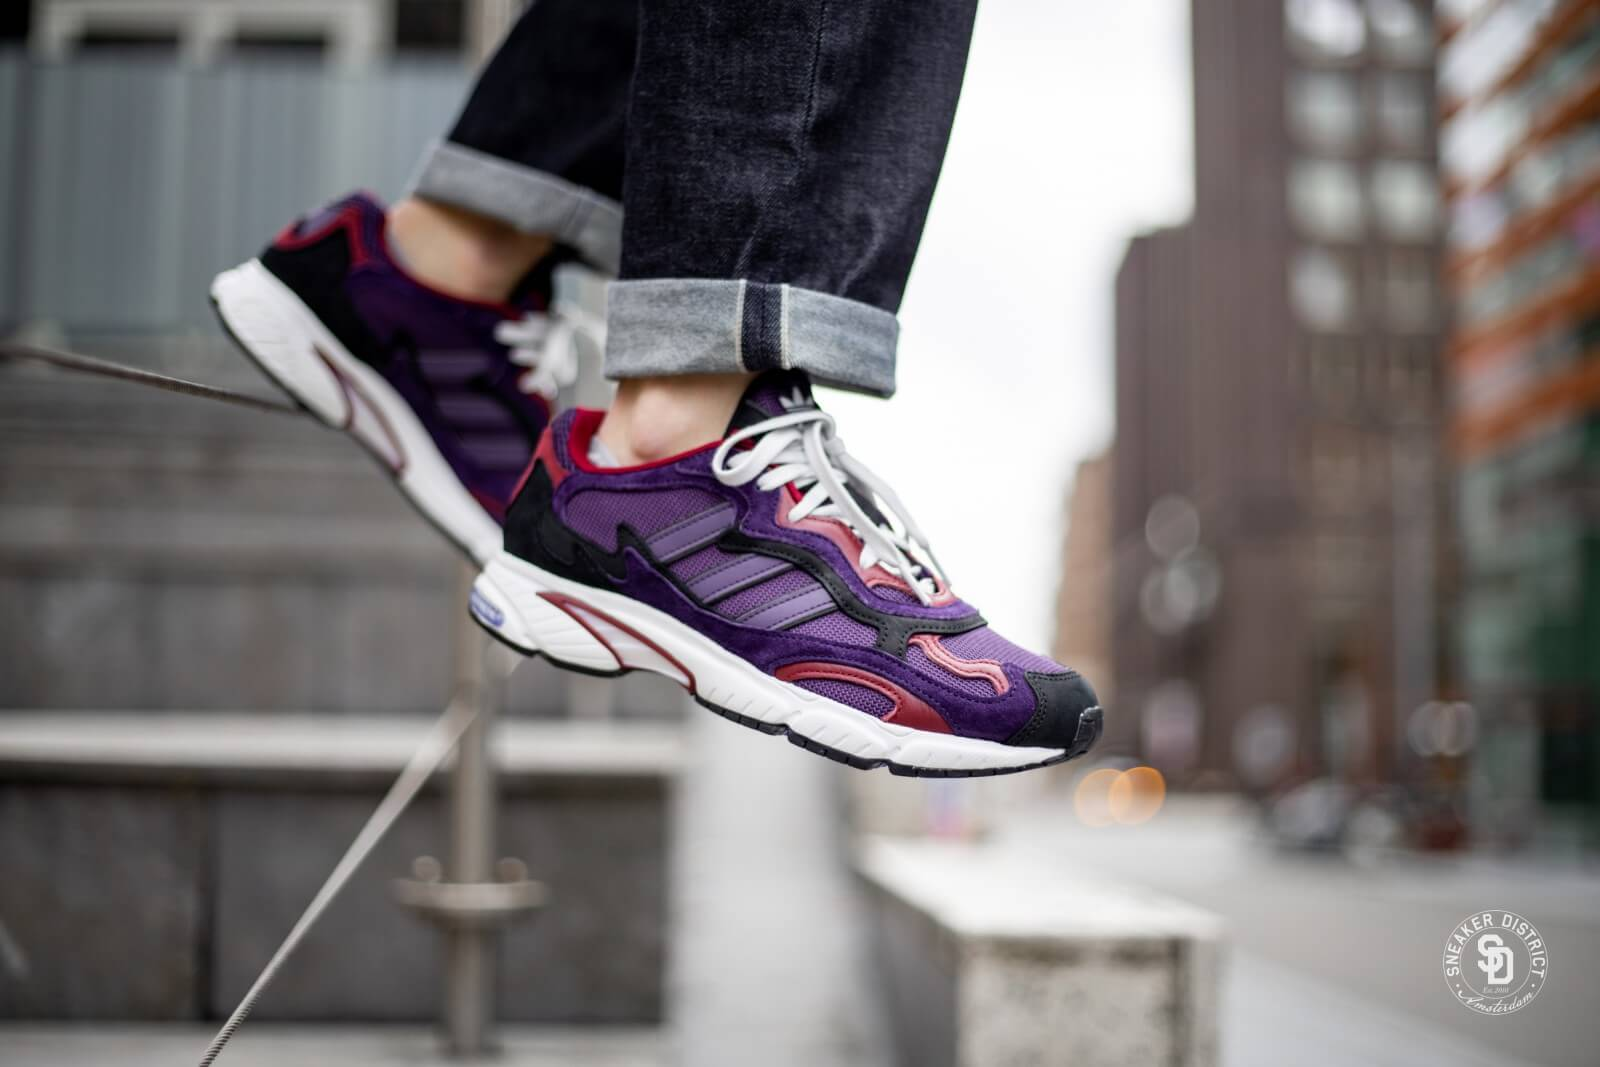 encima tanque Impresionismo  Adidas Temper Run Legend Purple/Burgundy - G27921